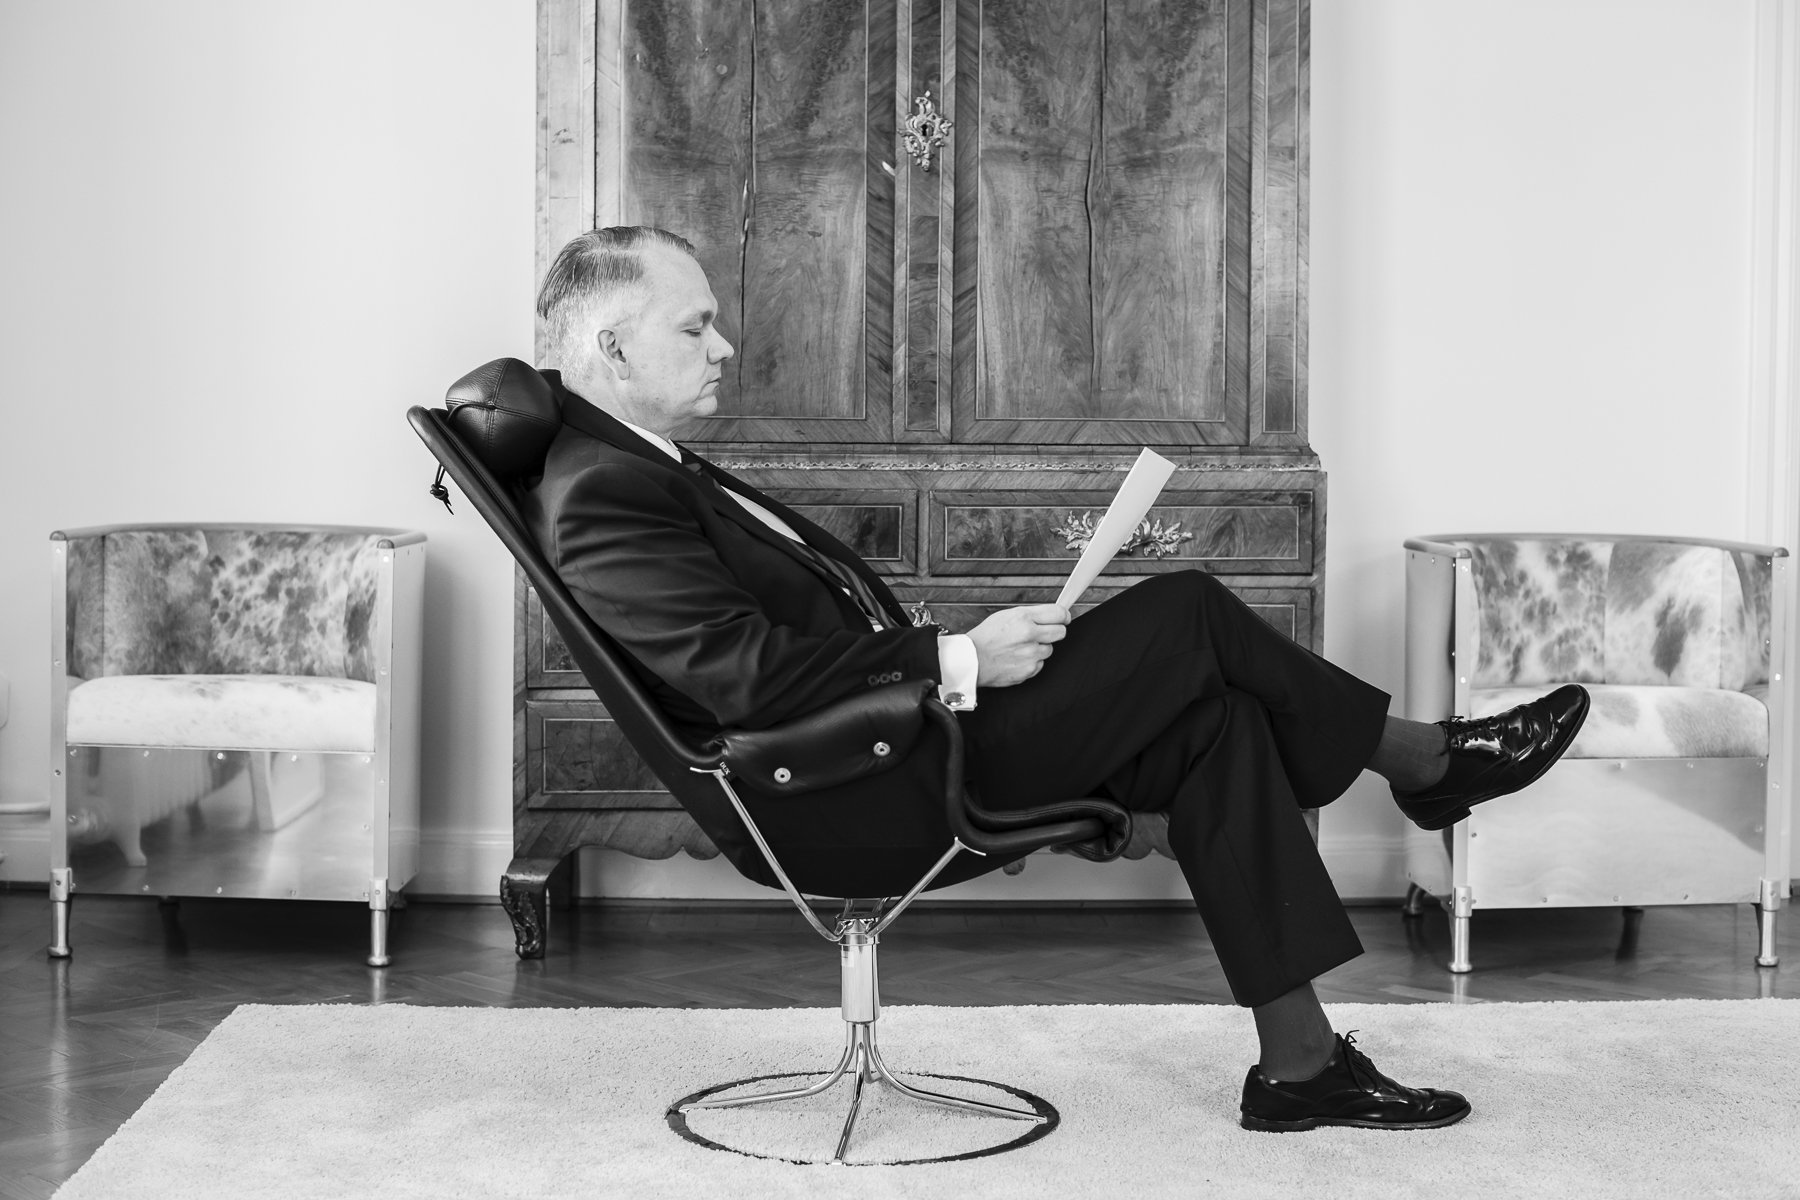 Erik M Gabrielsson